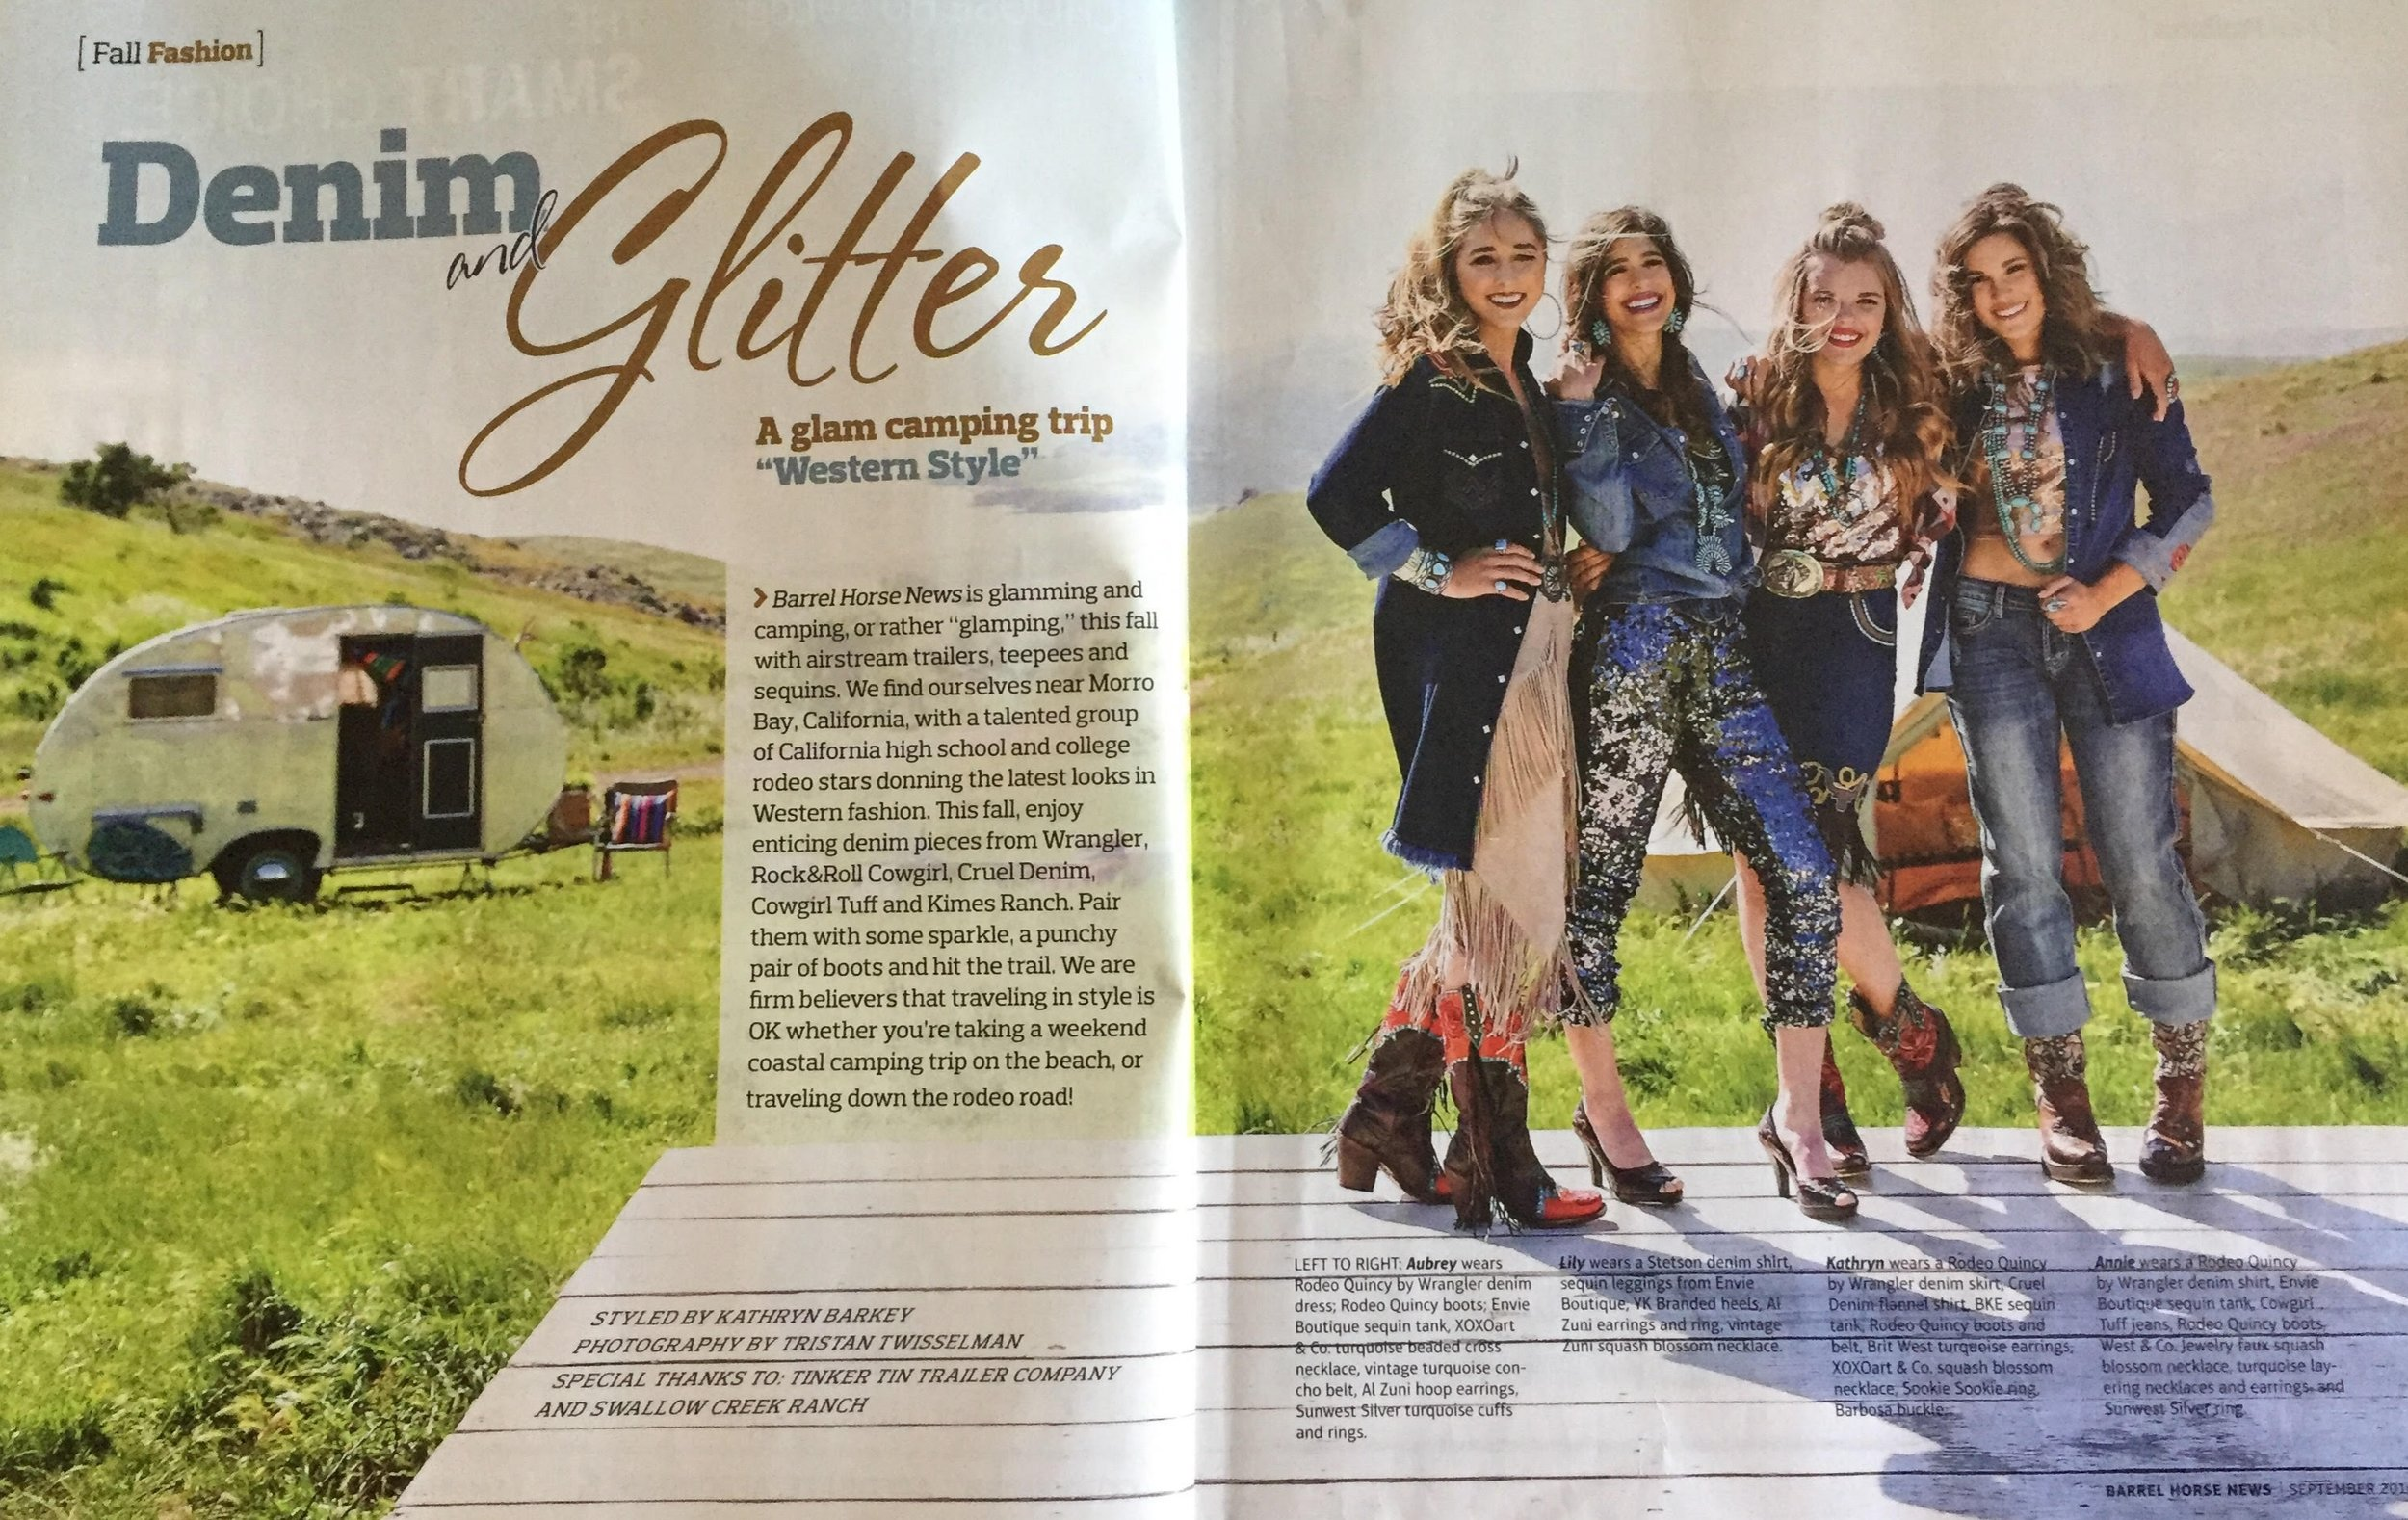 tinker-tin-trailer-co-barrel-house-news-magazine.jpg